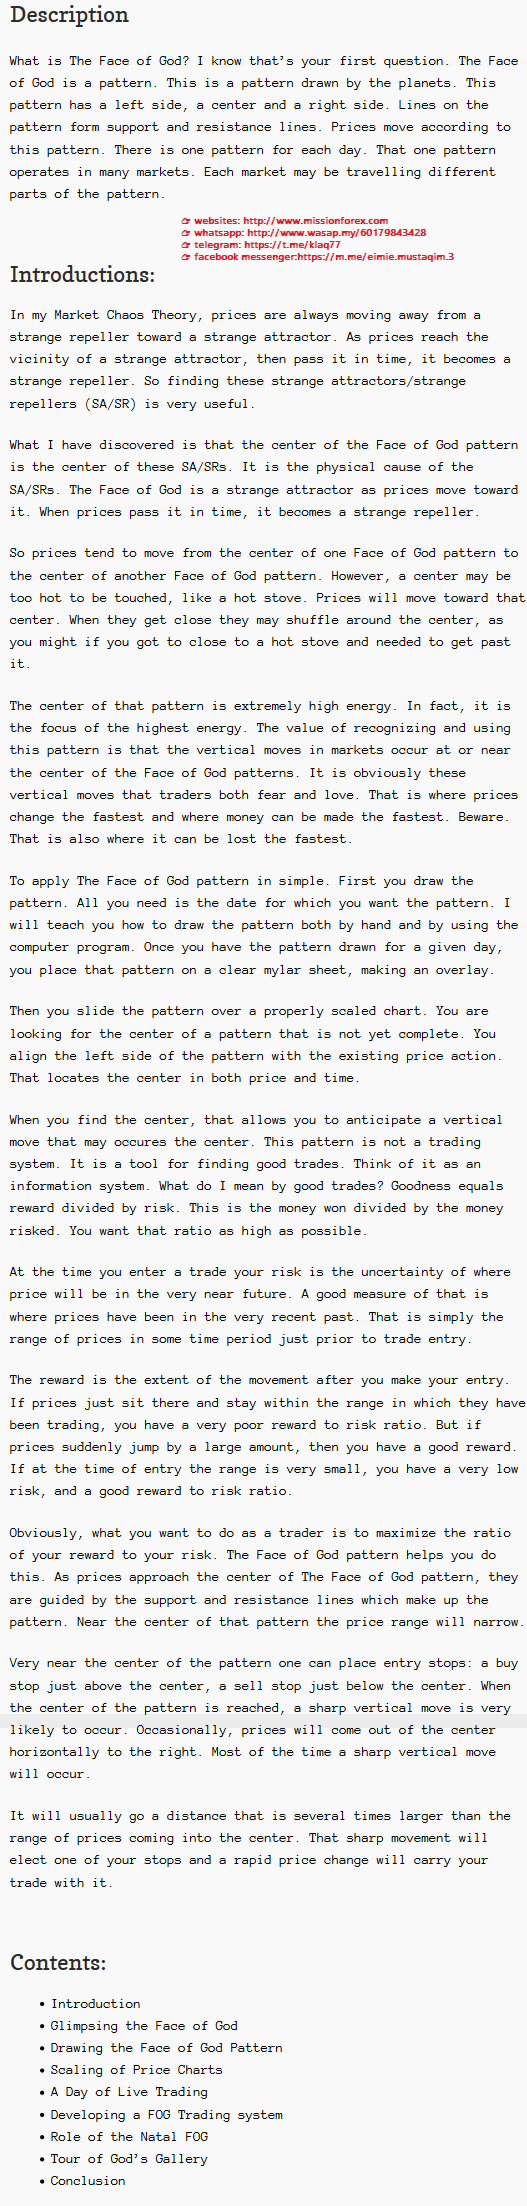 Russ Horn Forex Master Method Evolution Trading System (SEE 1 MORE Unbelievable BONUS INSIDE!)Al Larson - Hans Hannula